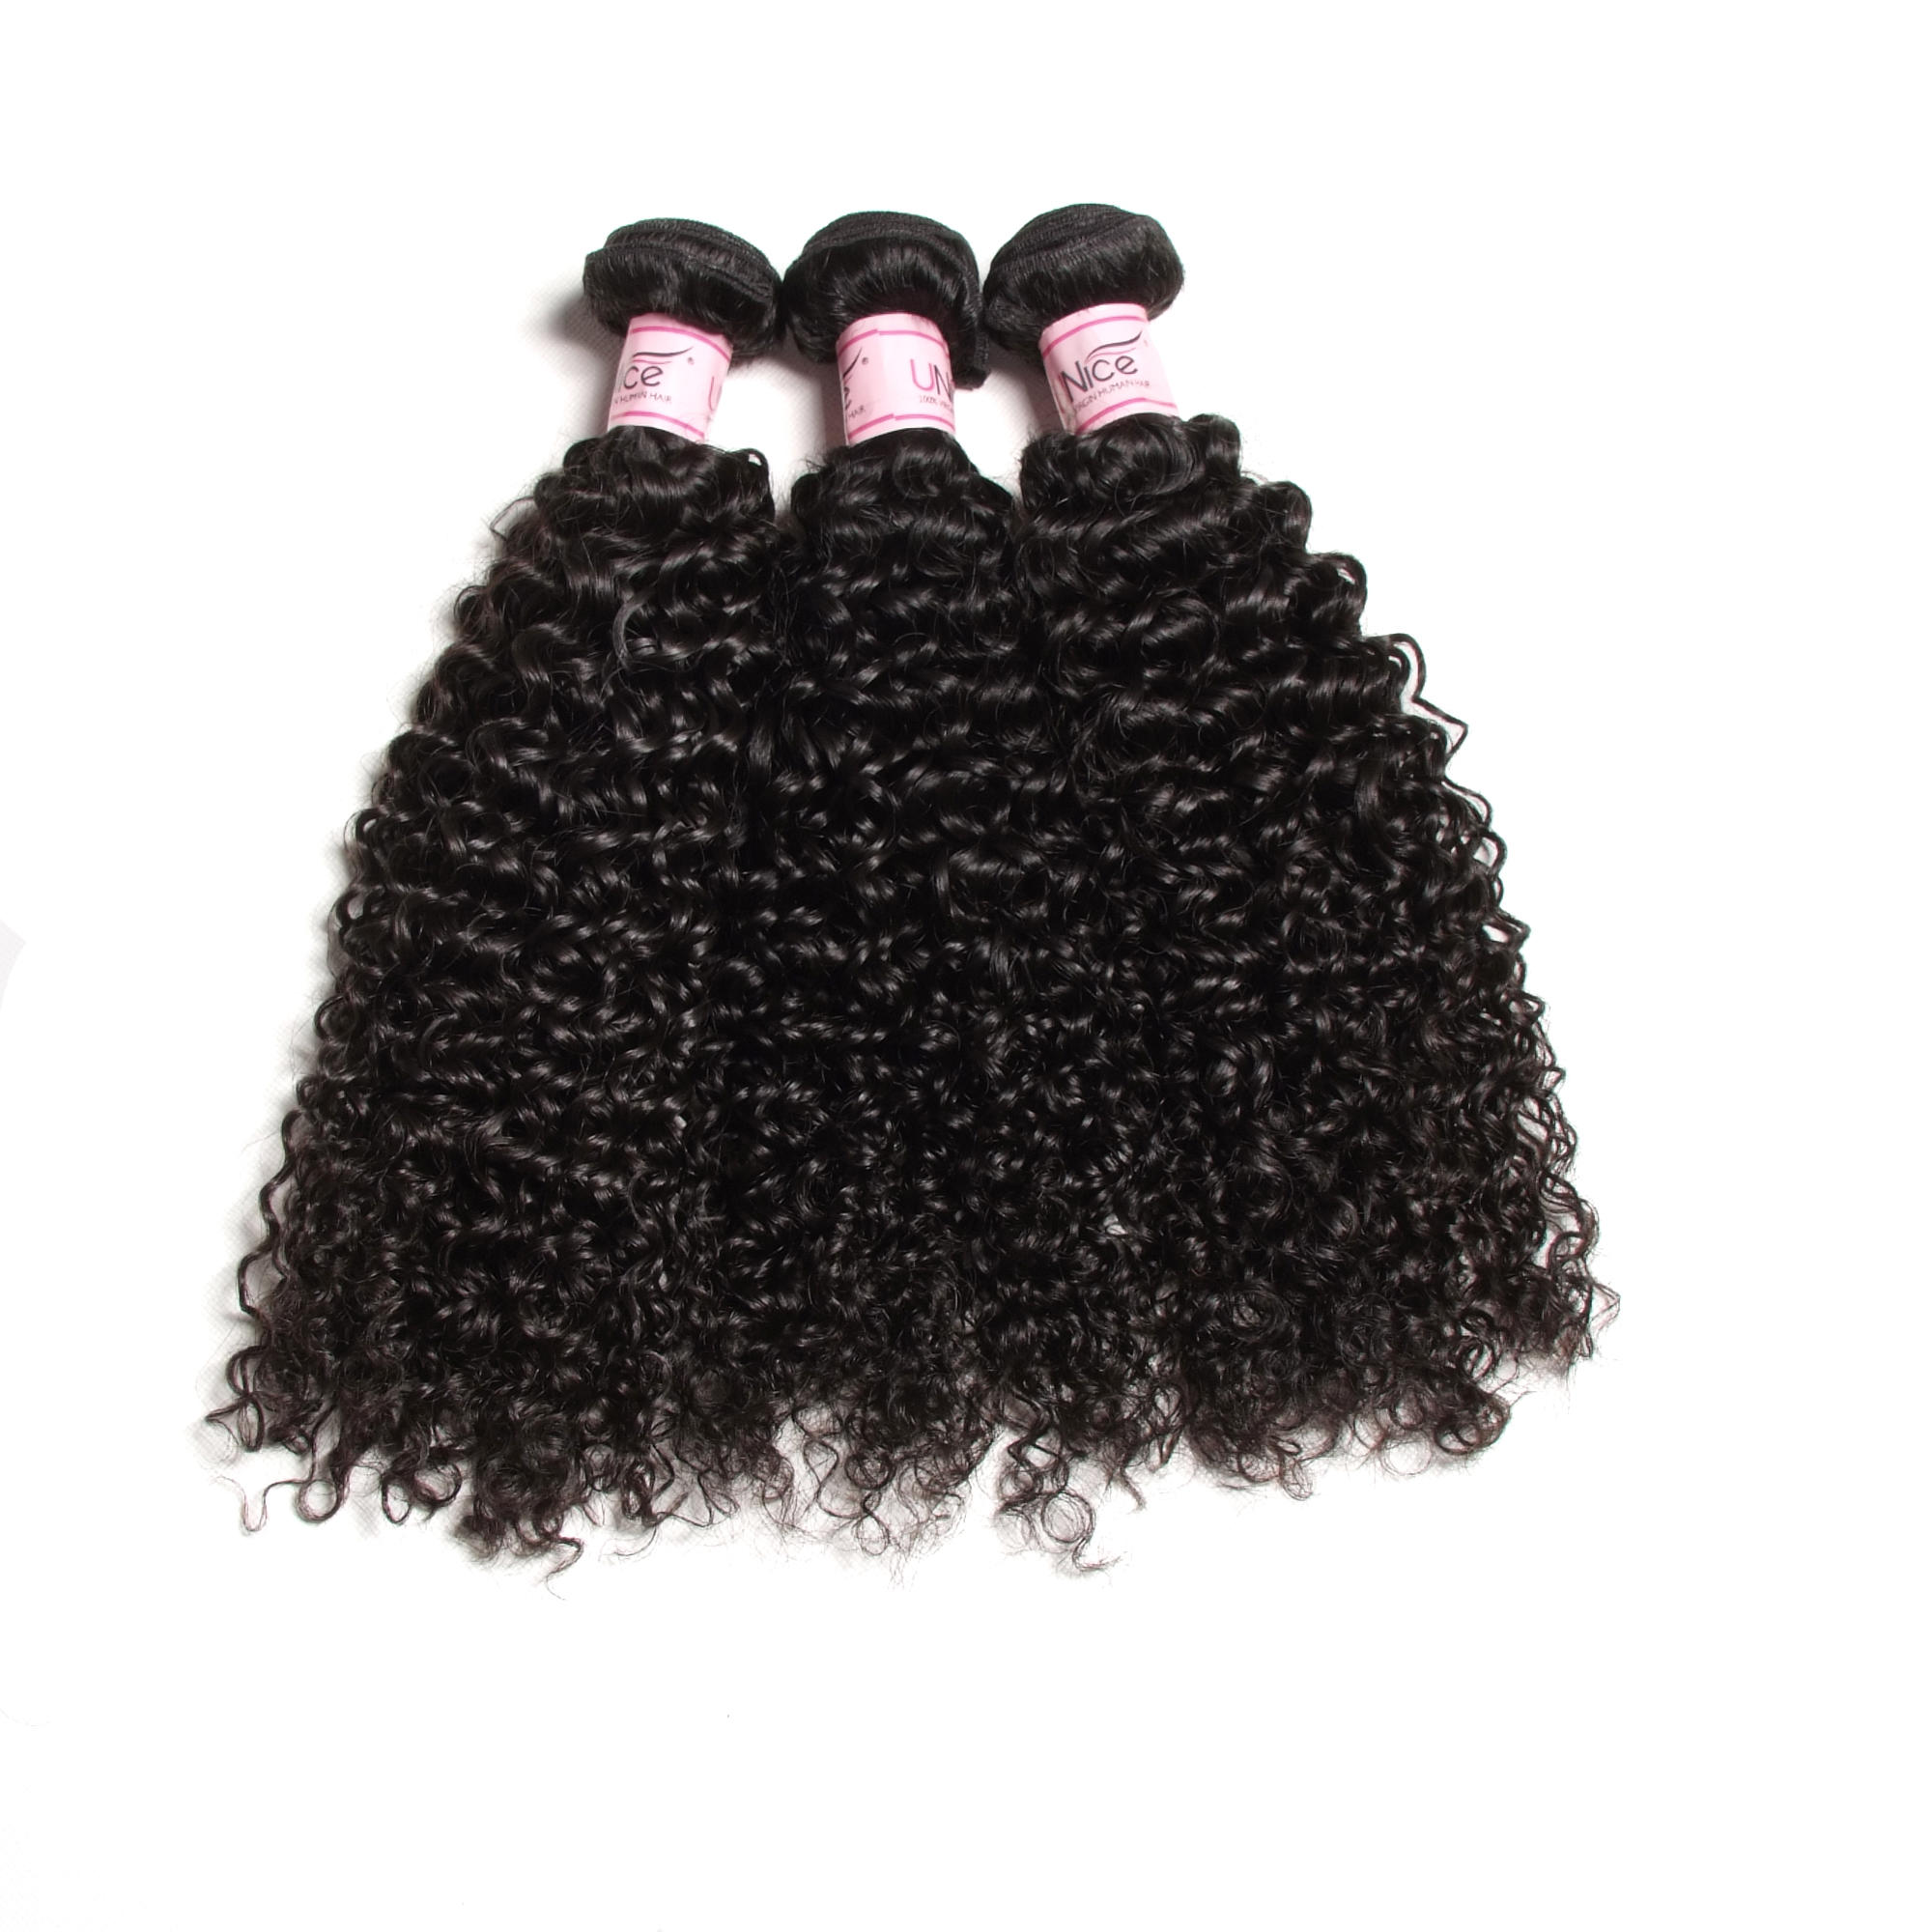 UNice Hair image 7